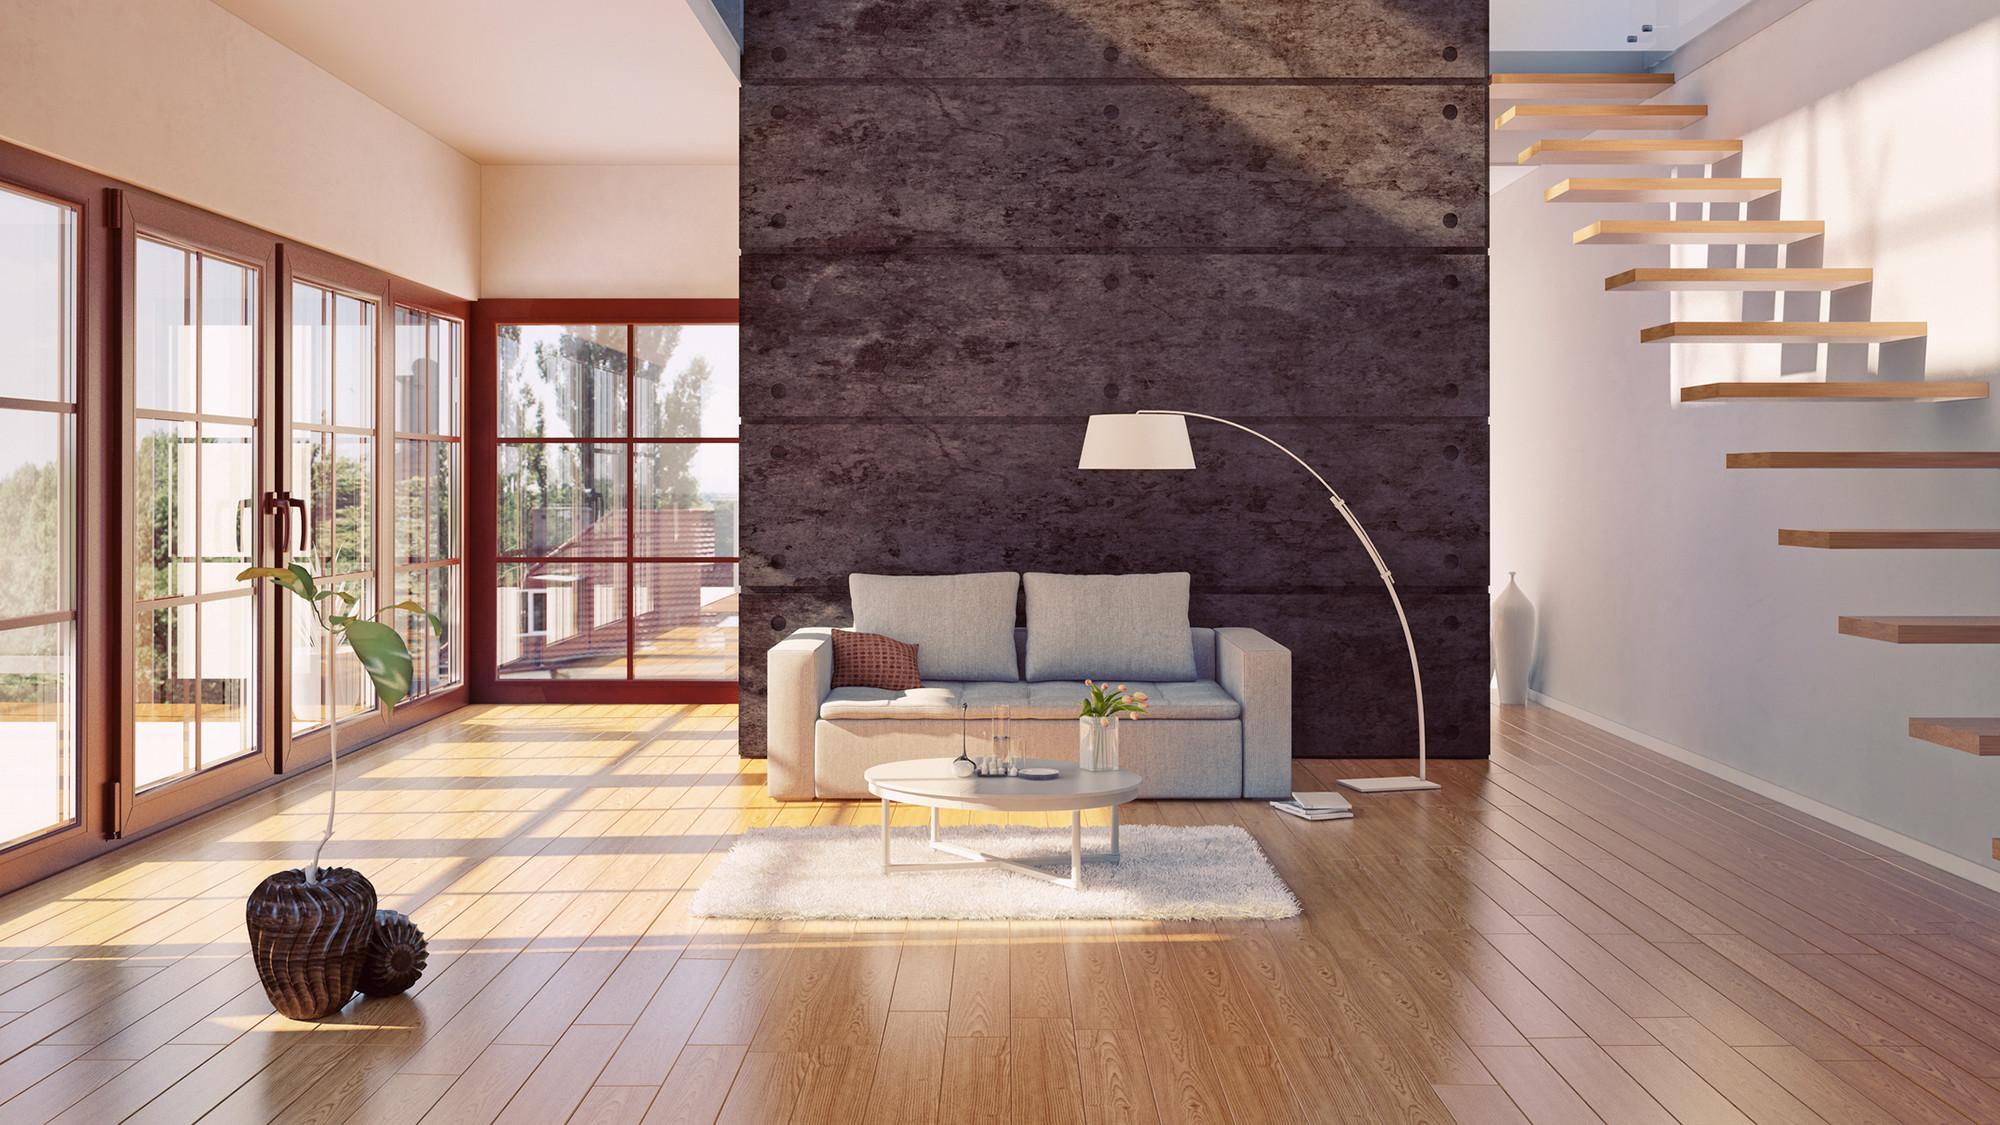 how to install hardwood floors over concrete slab of do hardwood floors provide the best return on investment realtor coma intended for hardwood floors investment